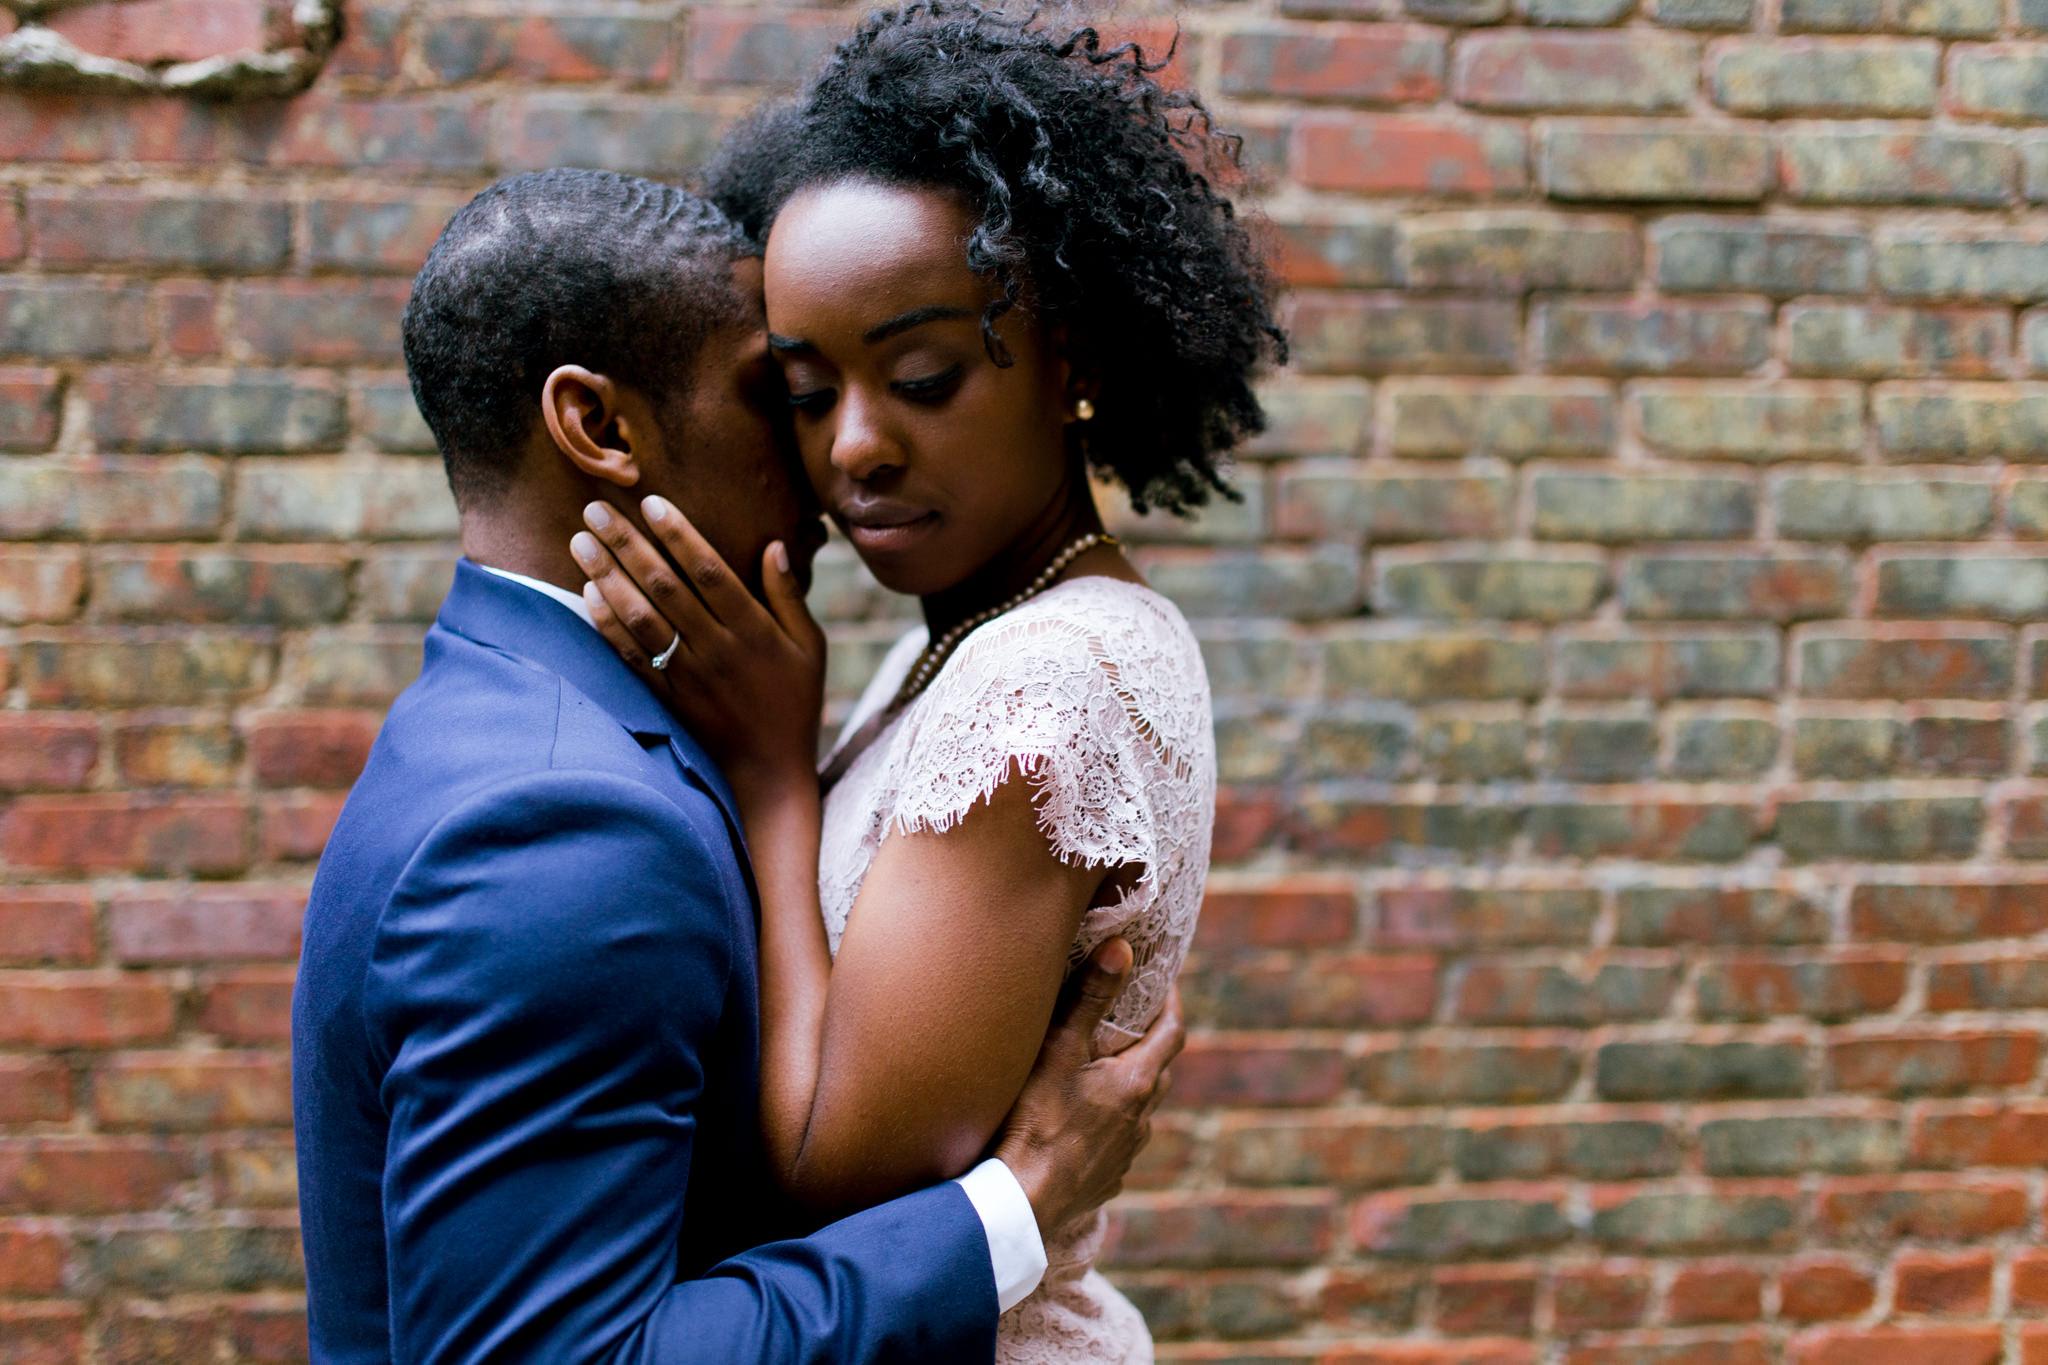 Grant-Park-Atlanta-Engagement-Pictures-Kiyah-C-Photography-25.jpg